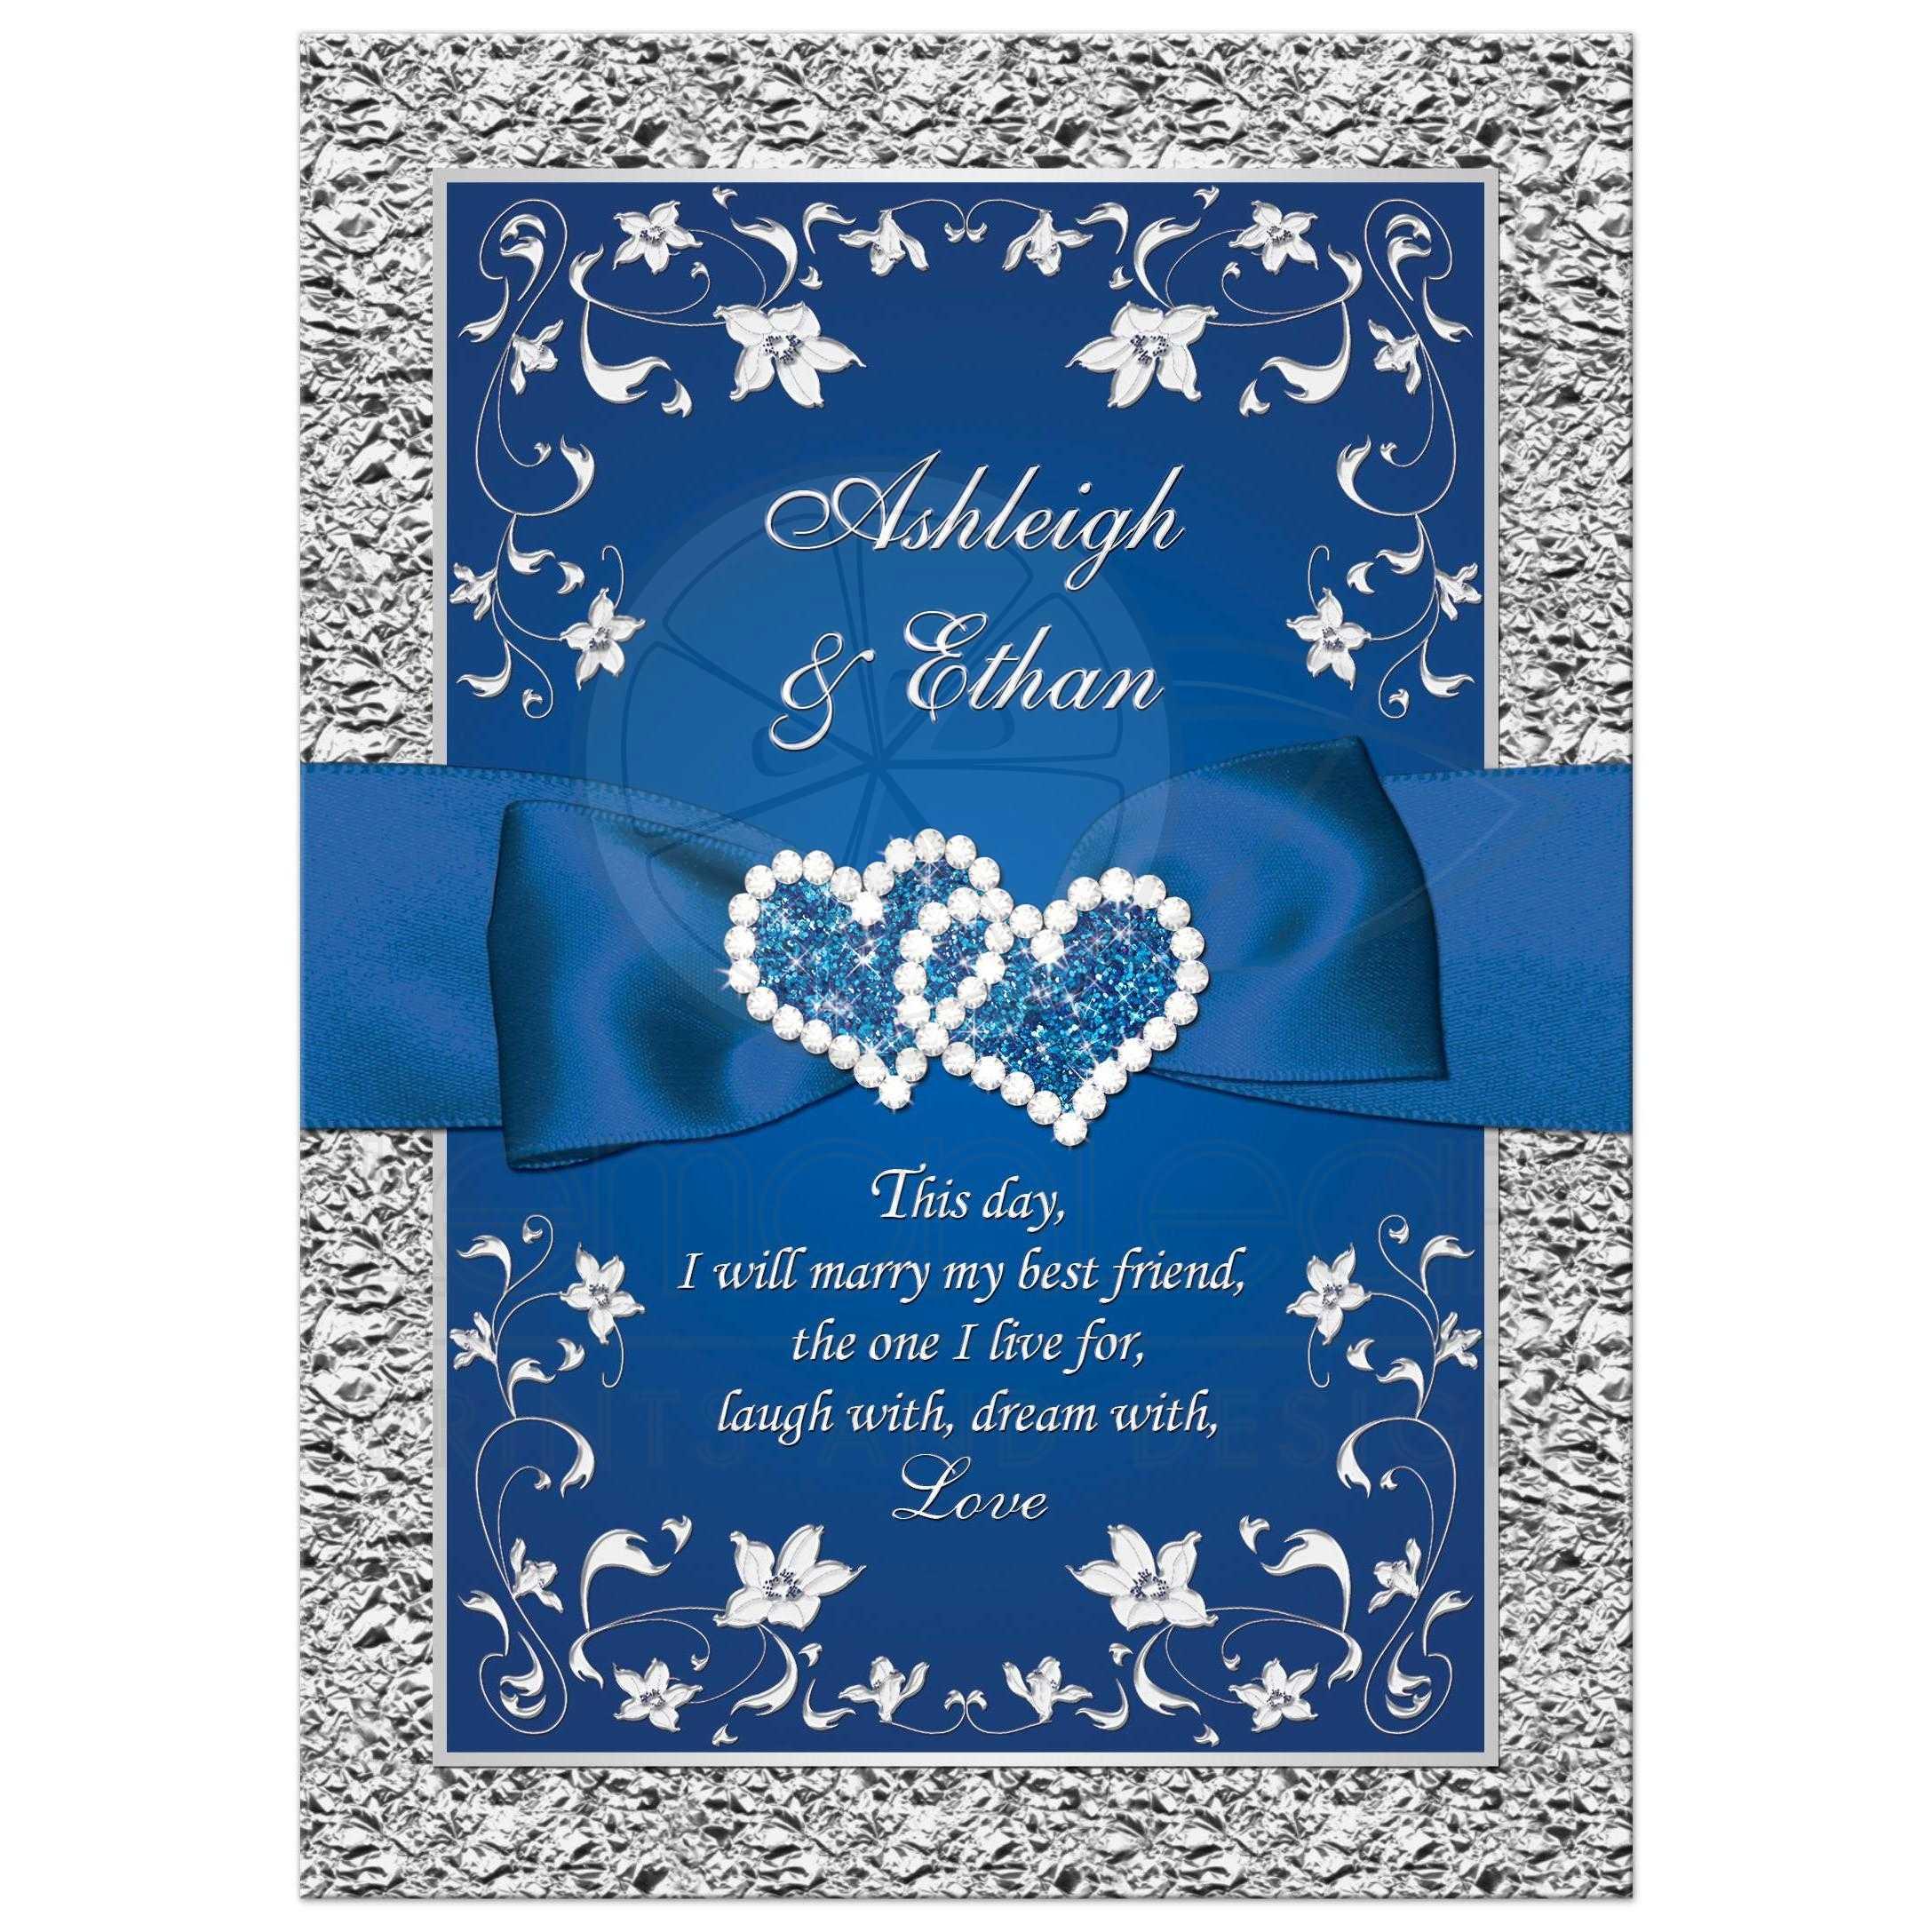 Fall String Lights Wallpaper Weddings Royal Blue Wedding Invitation Faux Foil Silver Floral